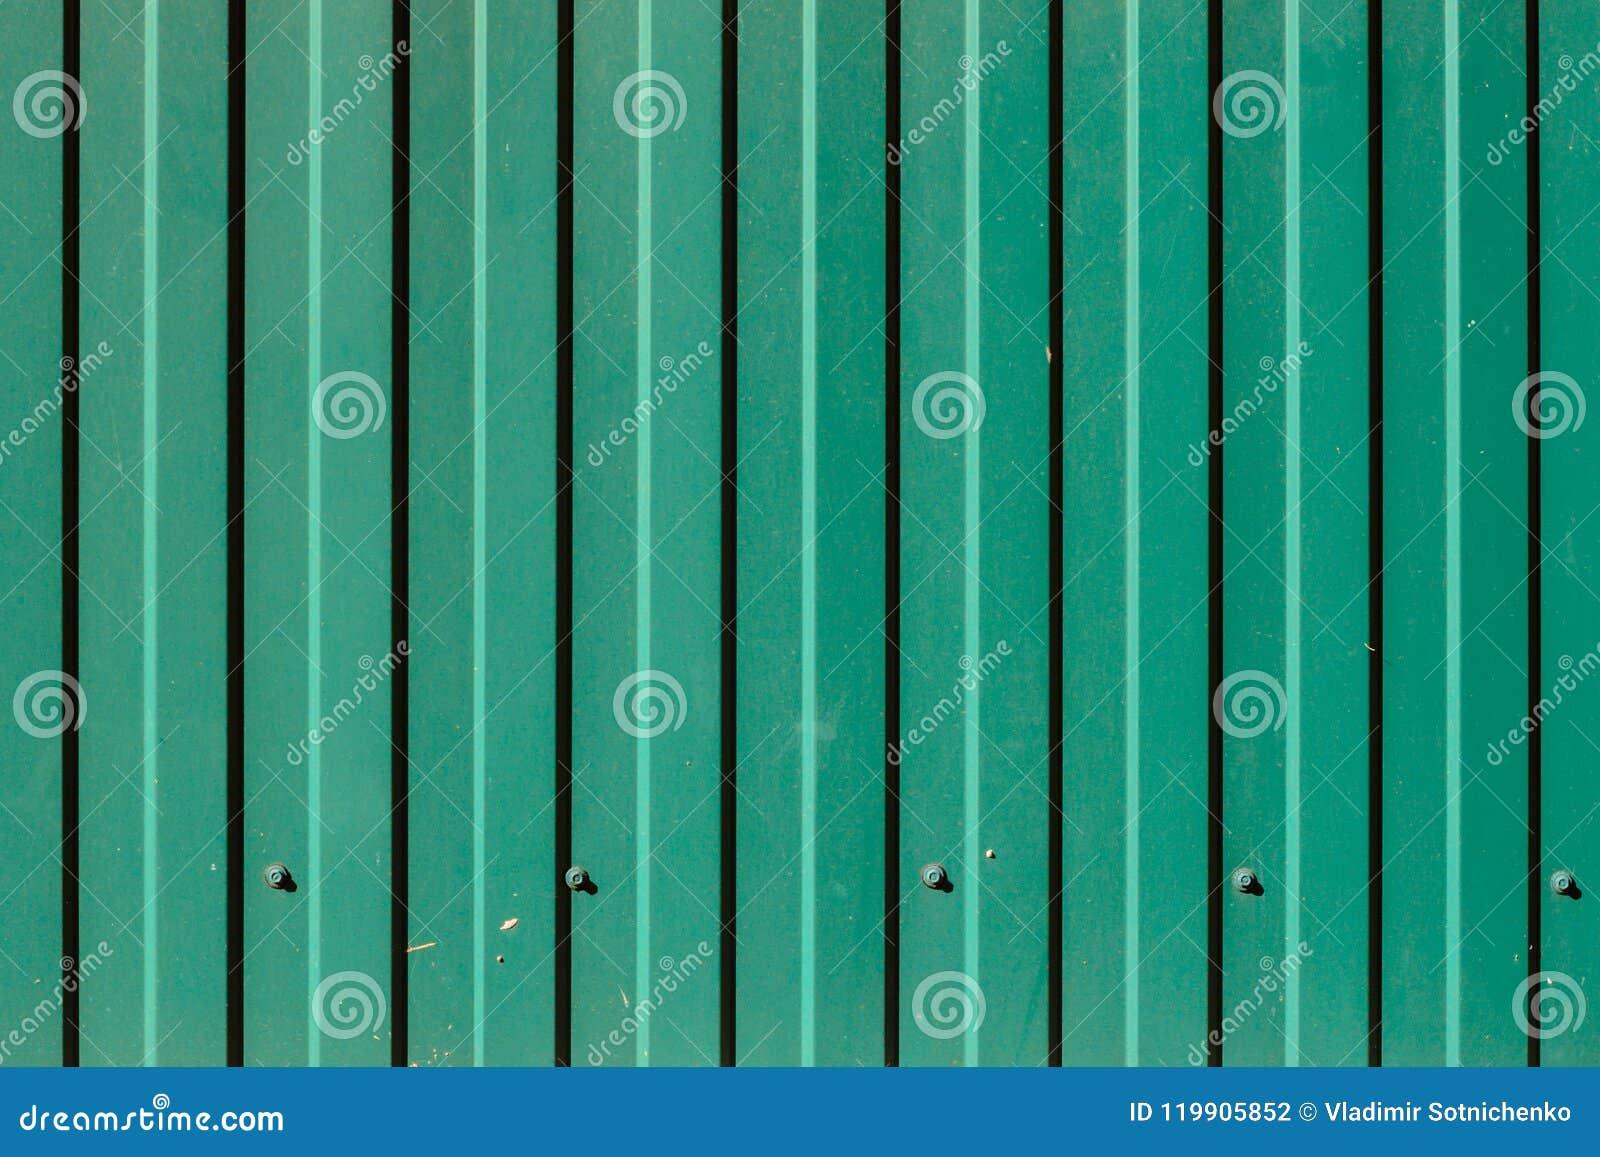 Green Corrugated Metal Panel Texture Stock Photo Image